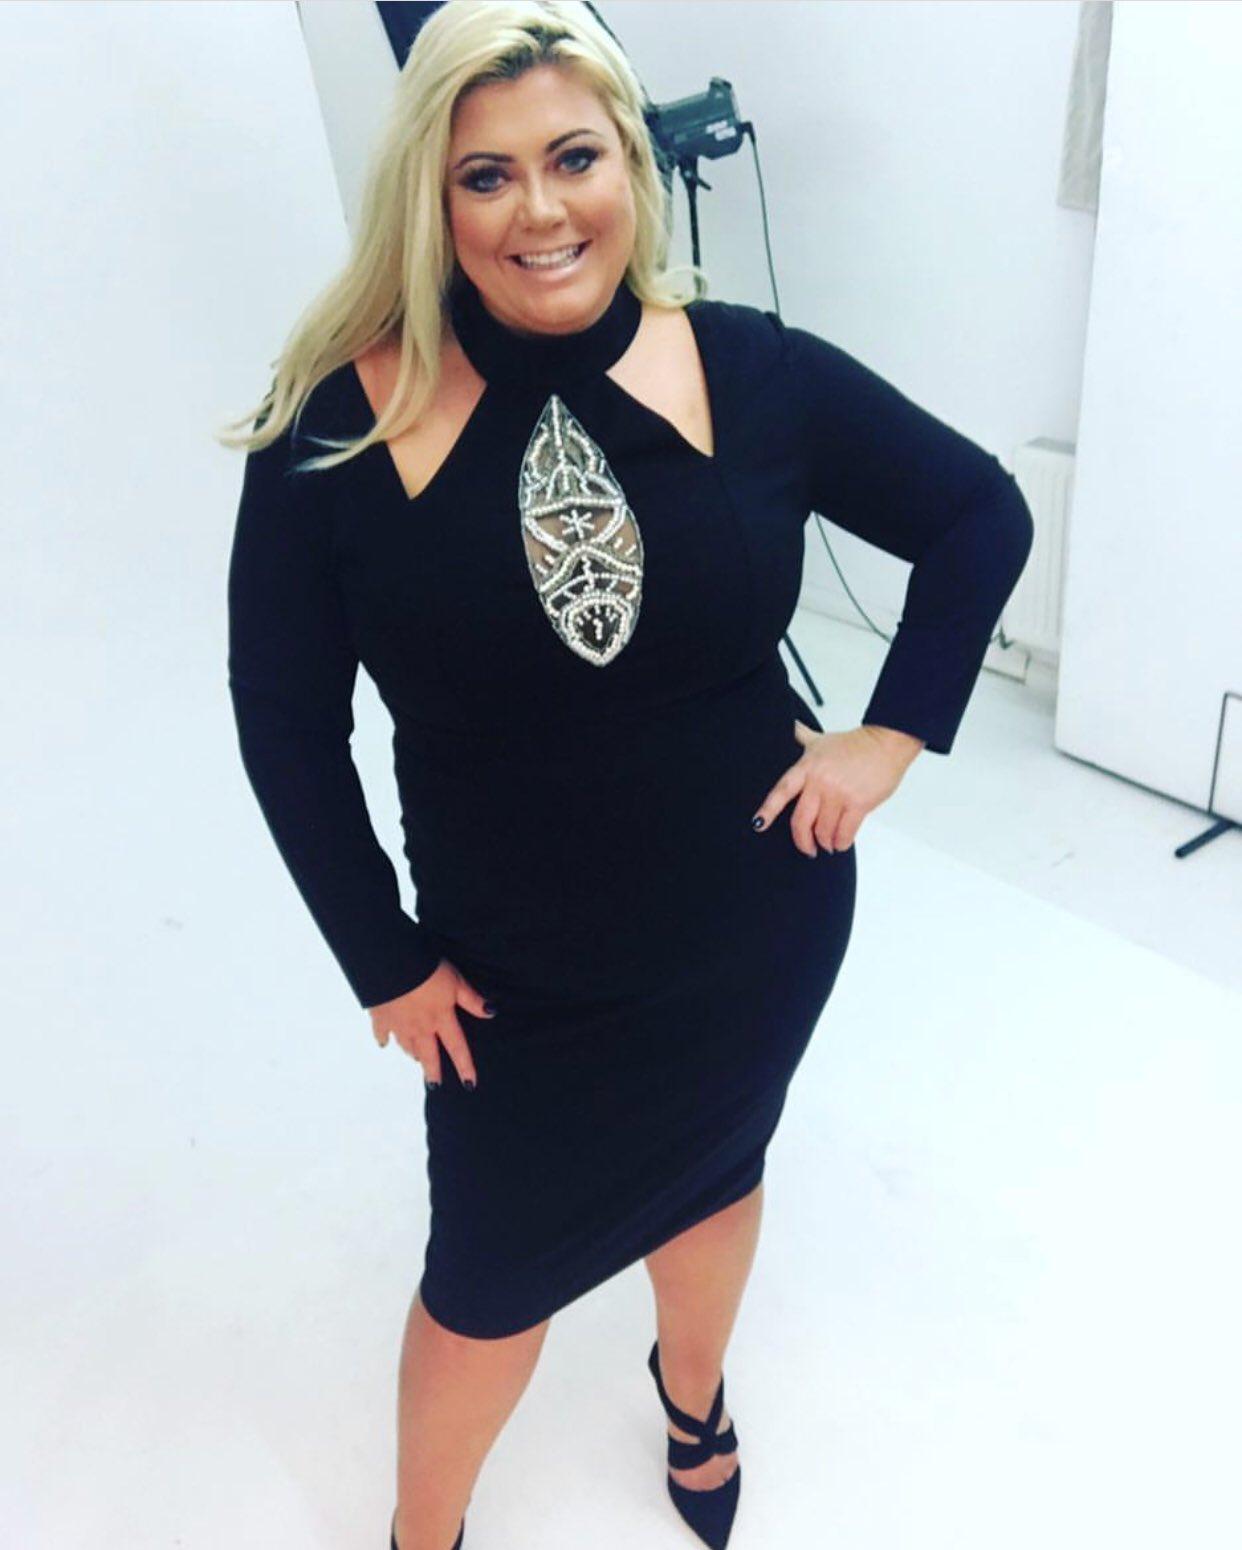 Fabulous curve fashion 💥🔥💥 https://t.co/s5Bo1c7ISn plus size clothing collection https://t.co/yeZZIDqFob